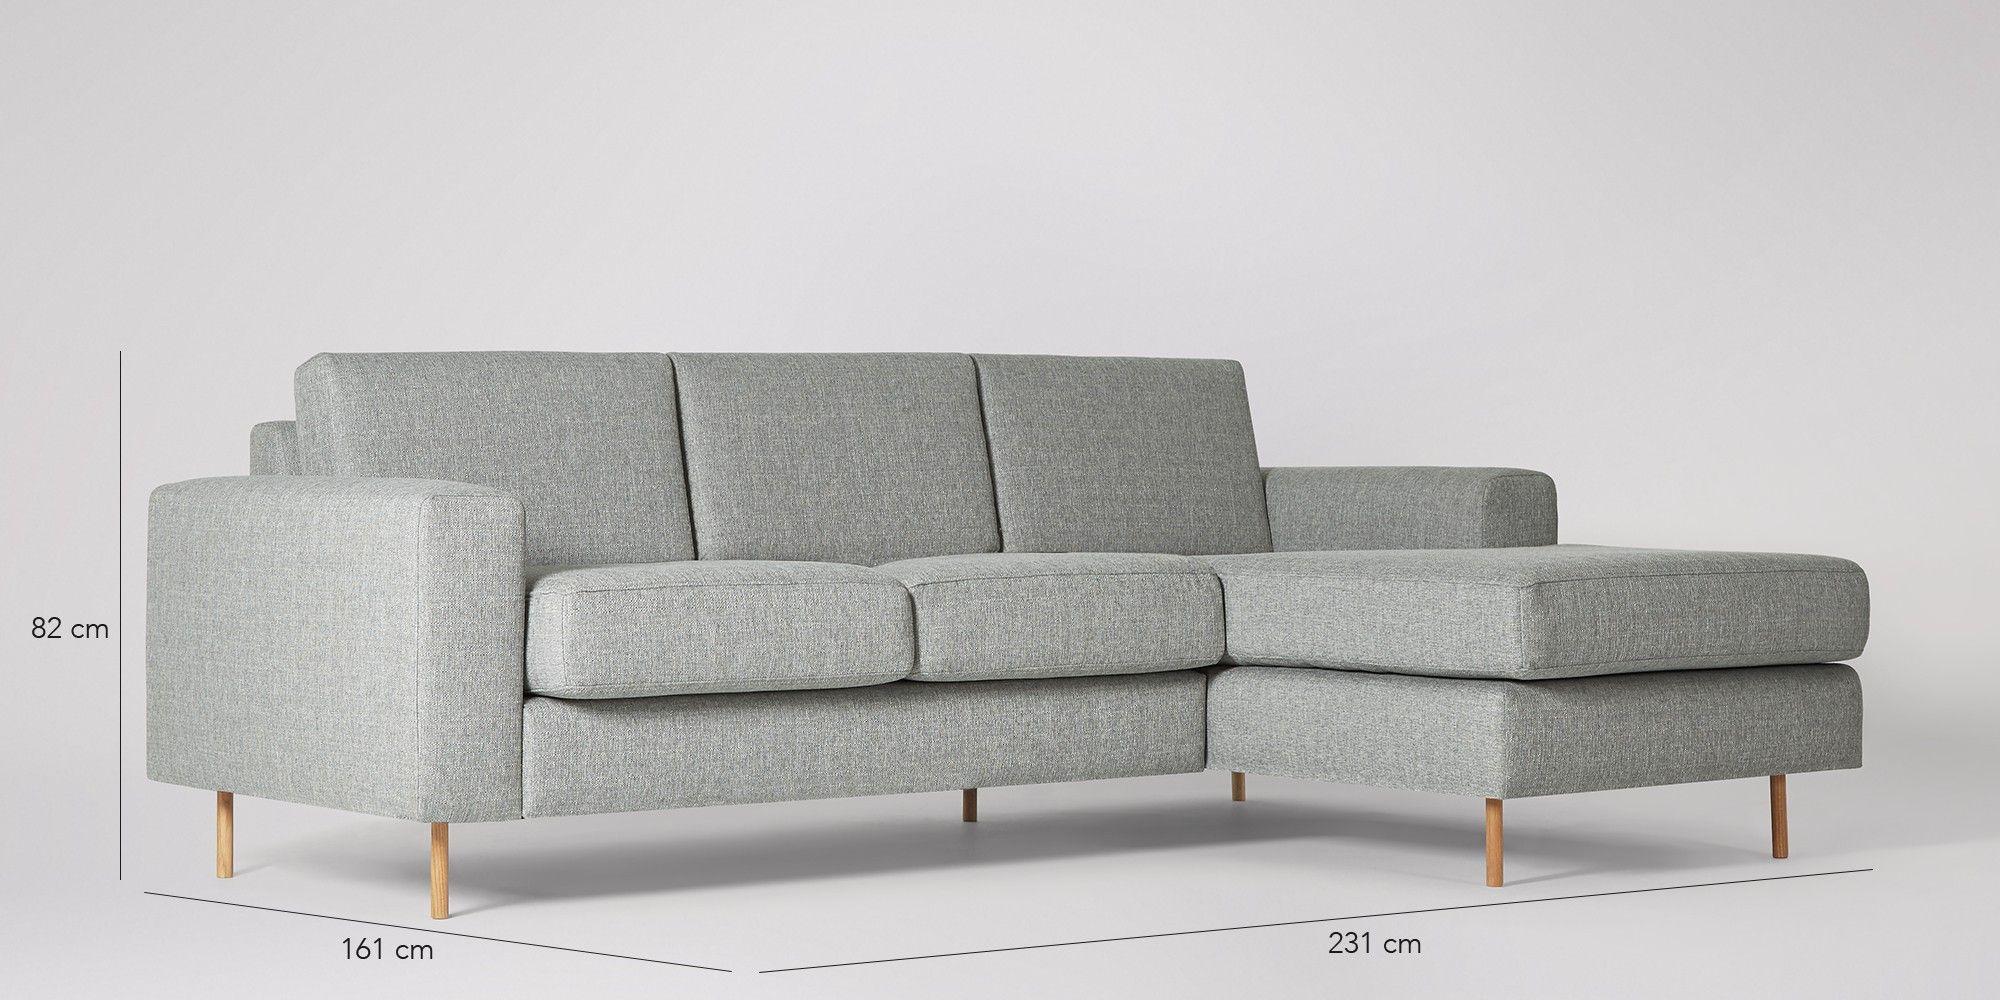 Full Size of Mokumuku Franz Malvern Sofa Französische Betten Fertig Wohnzimmer Mokumuku Franz